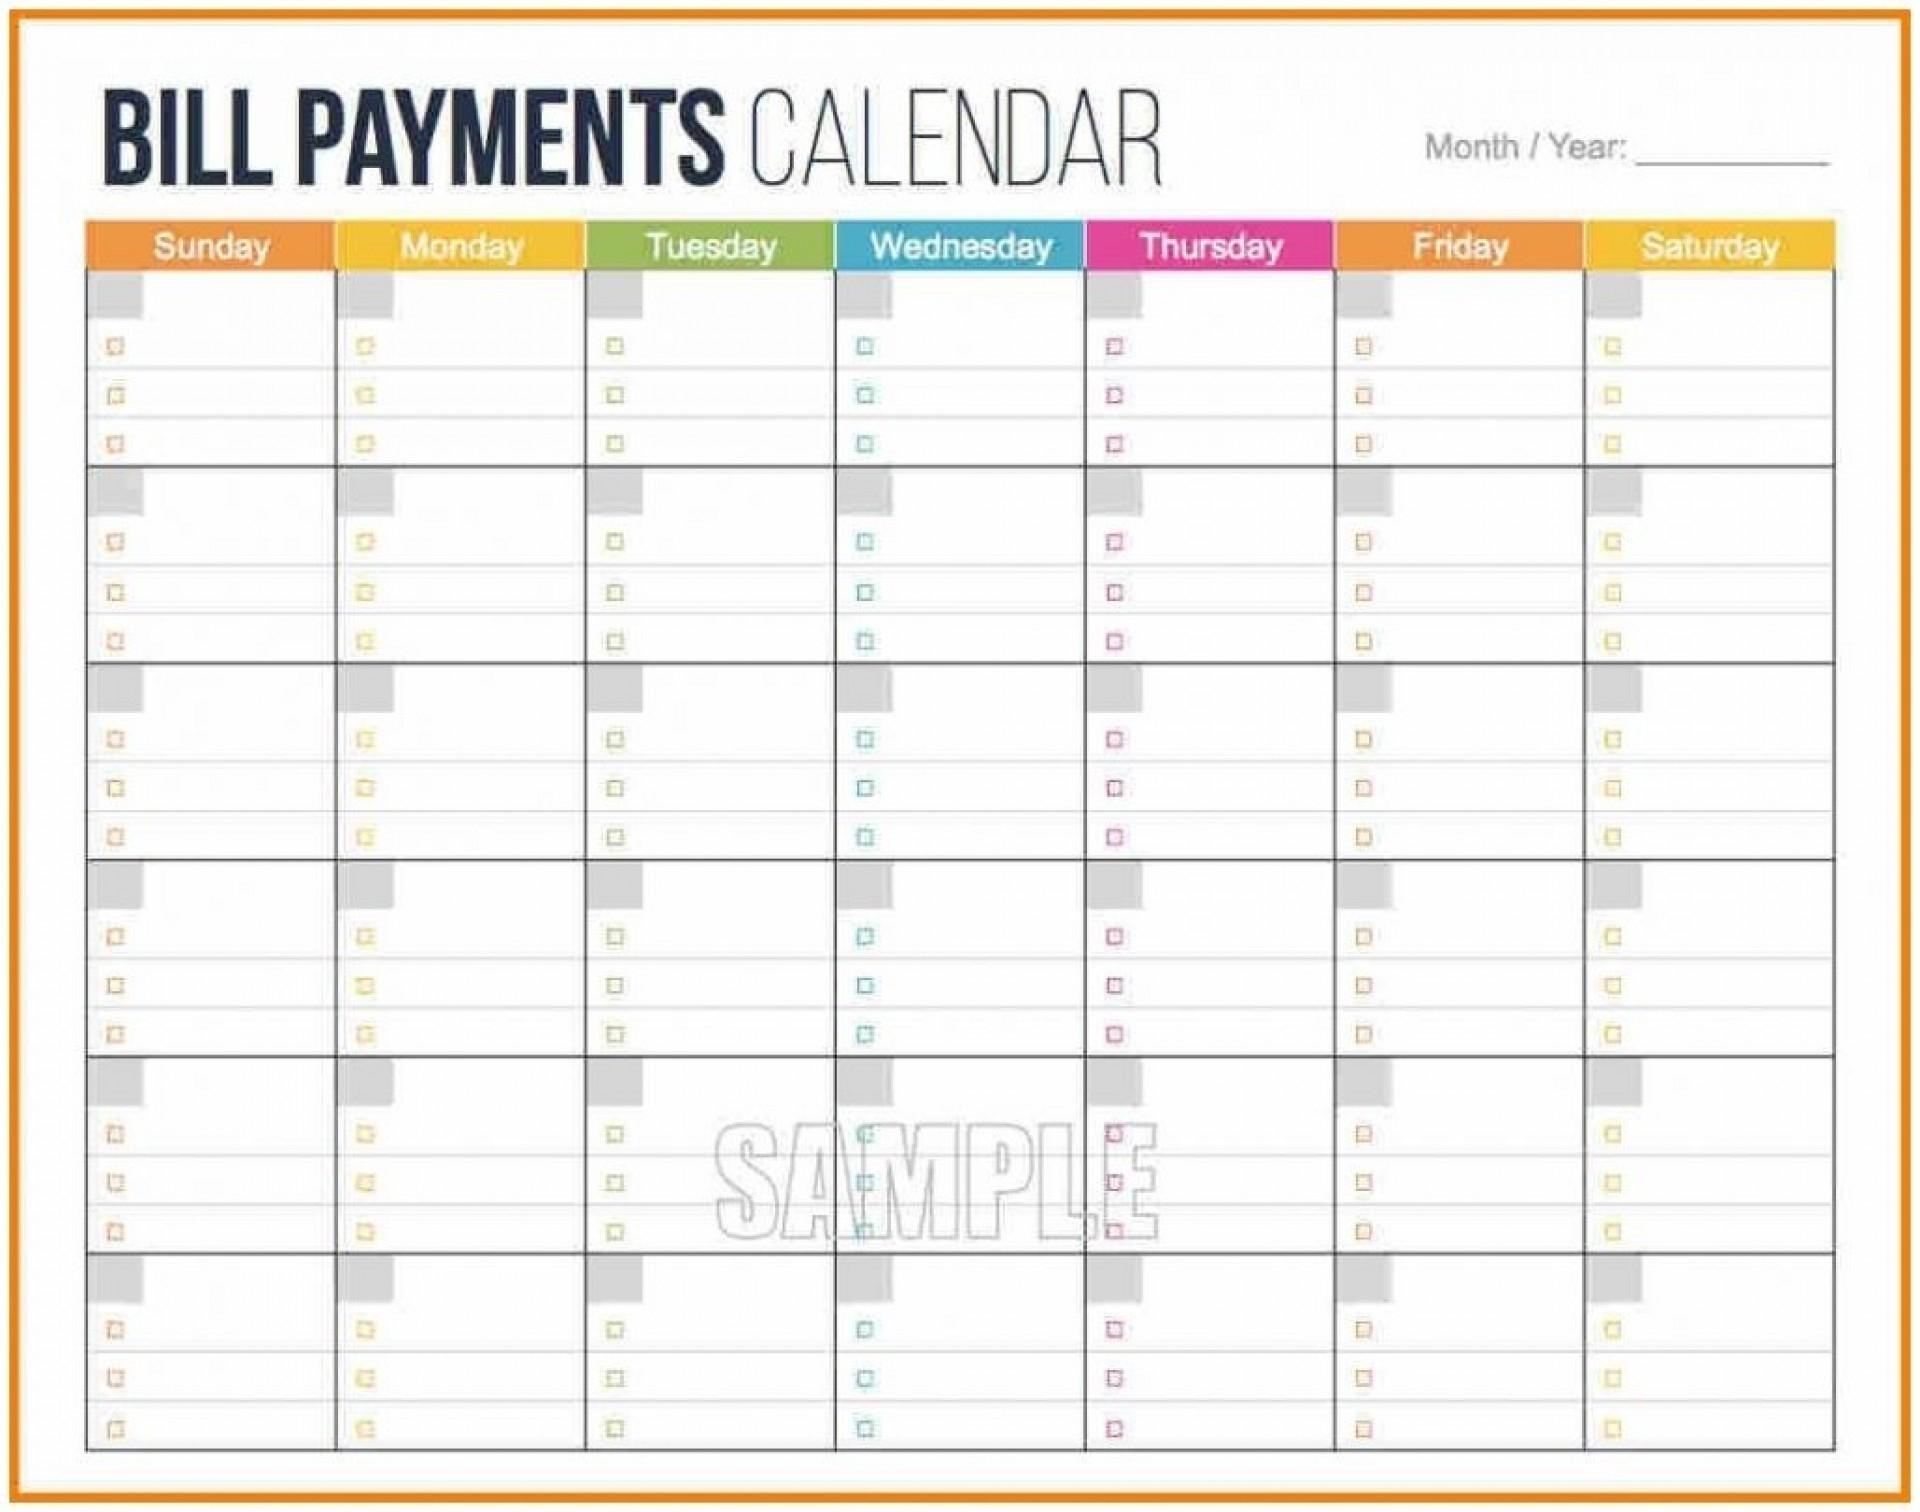 003 Bill Pay Calendar Template Ideas Paying Free Printable-Printable Calendar 2020 Monthly Bills